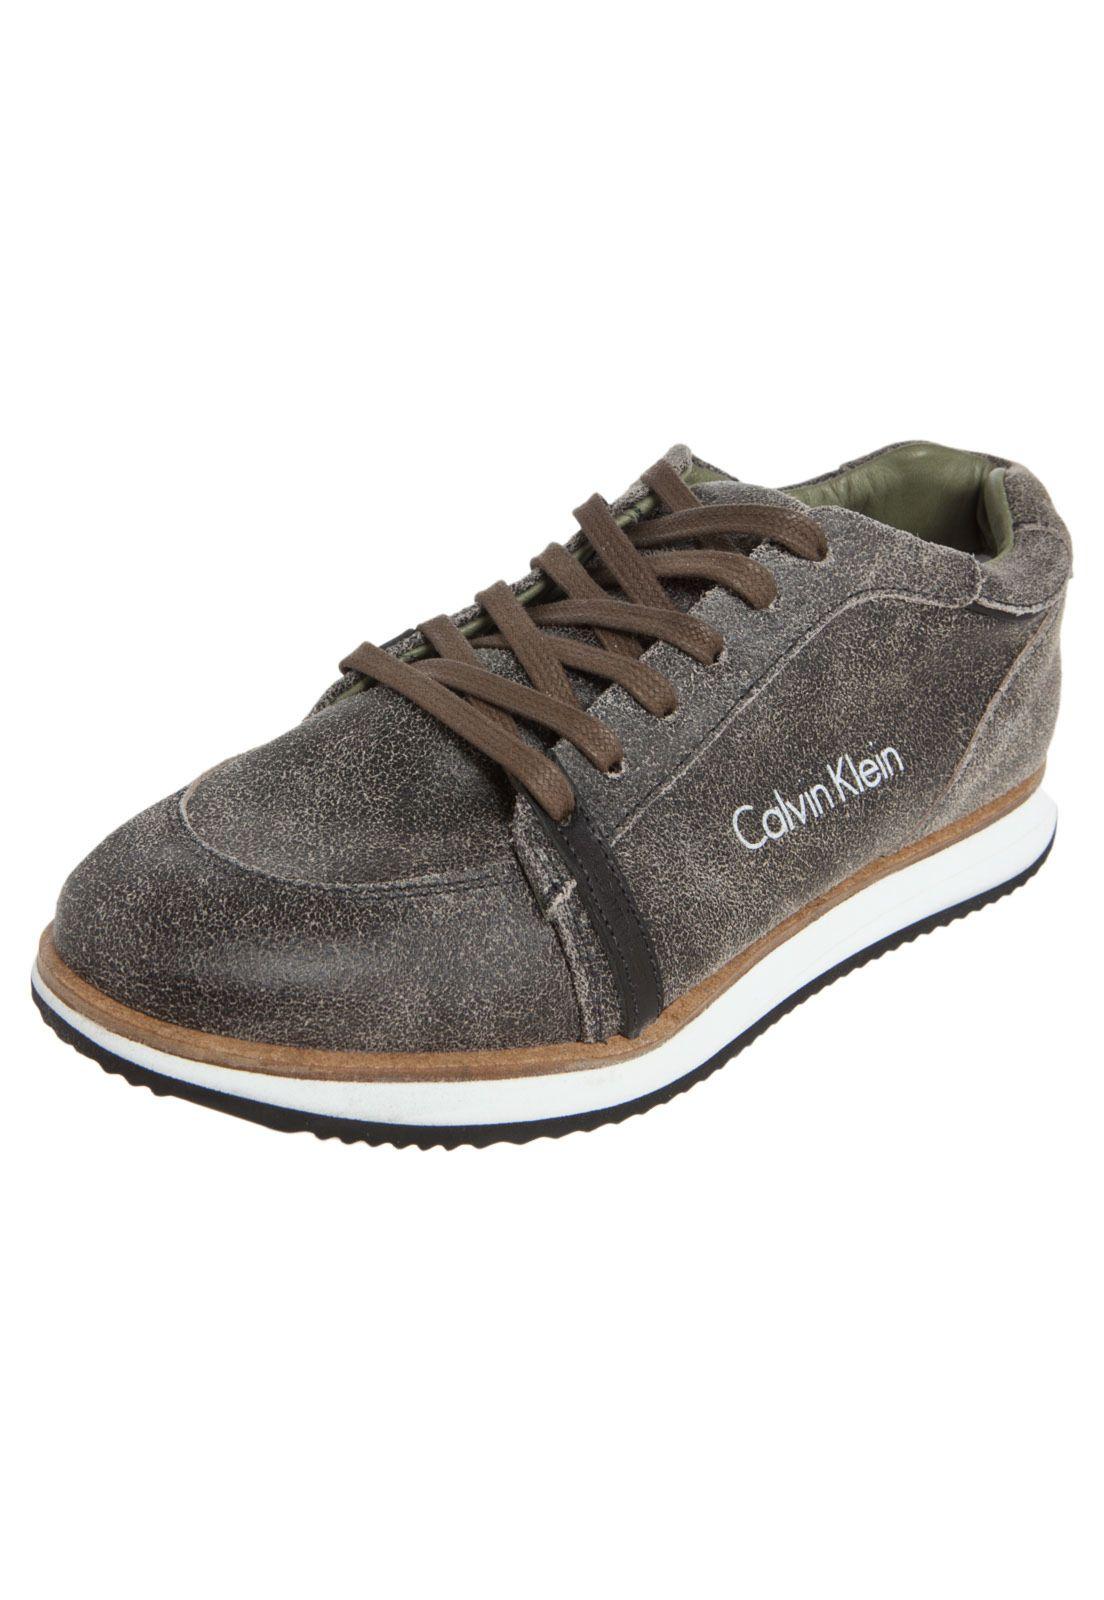 e0457b3f36a Tênis Calvin Klein Huen Marrom - Compre Agora